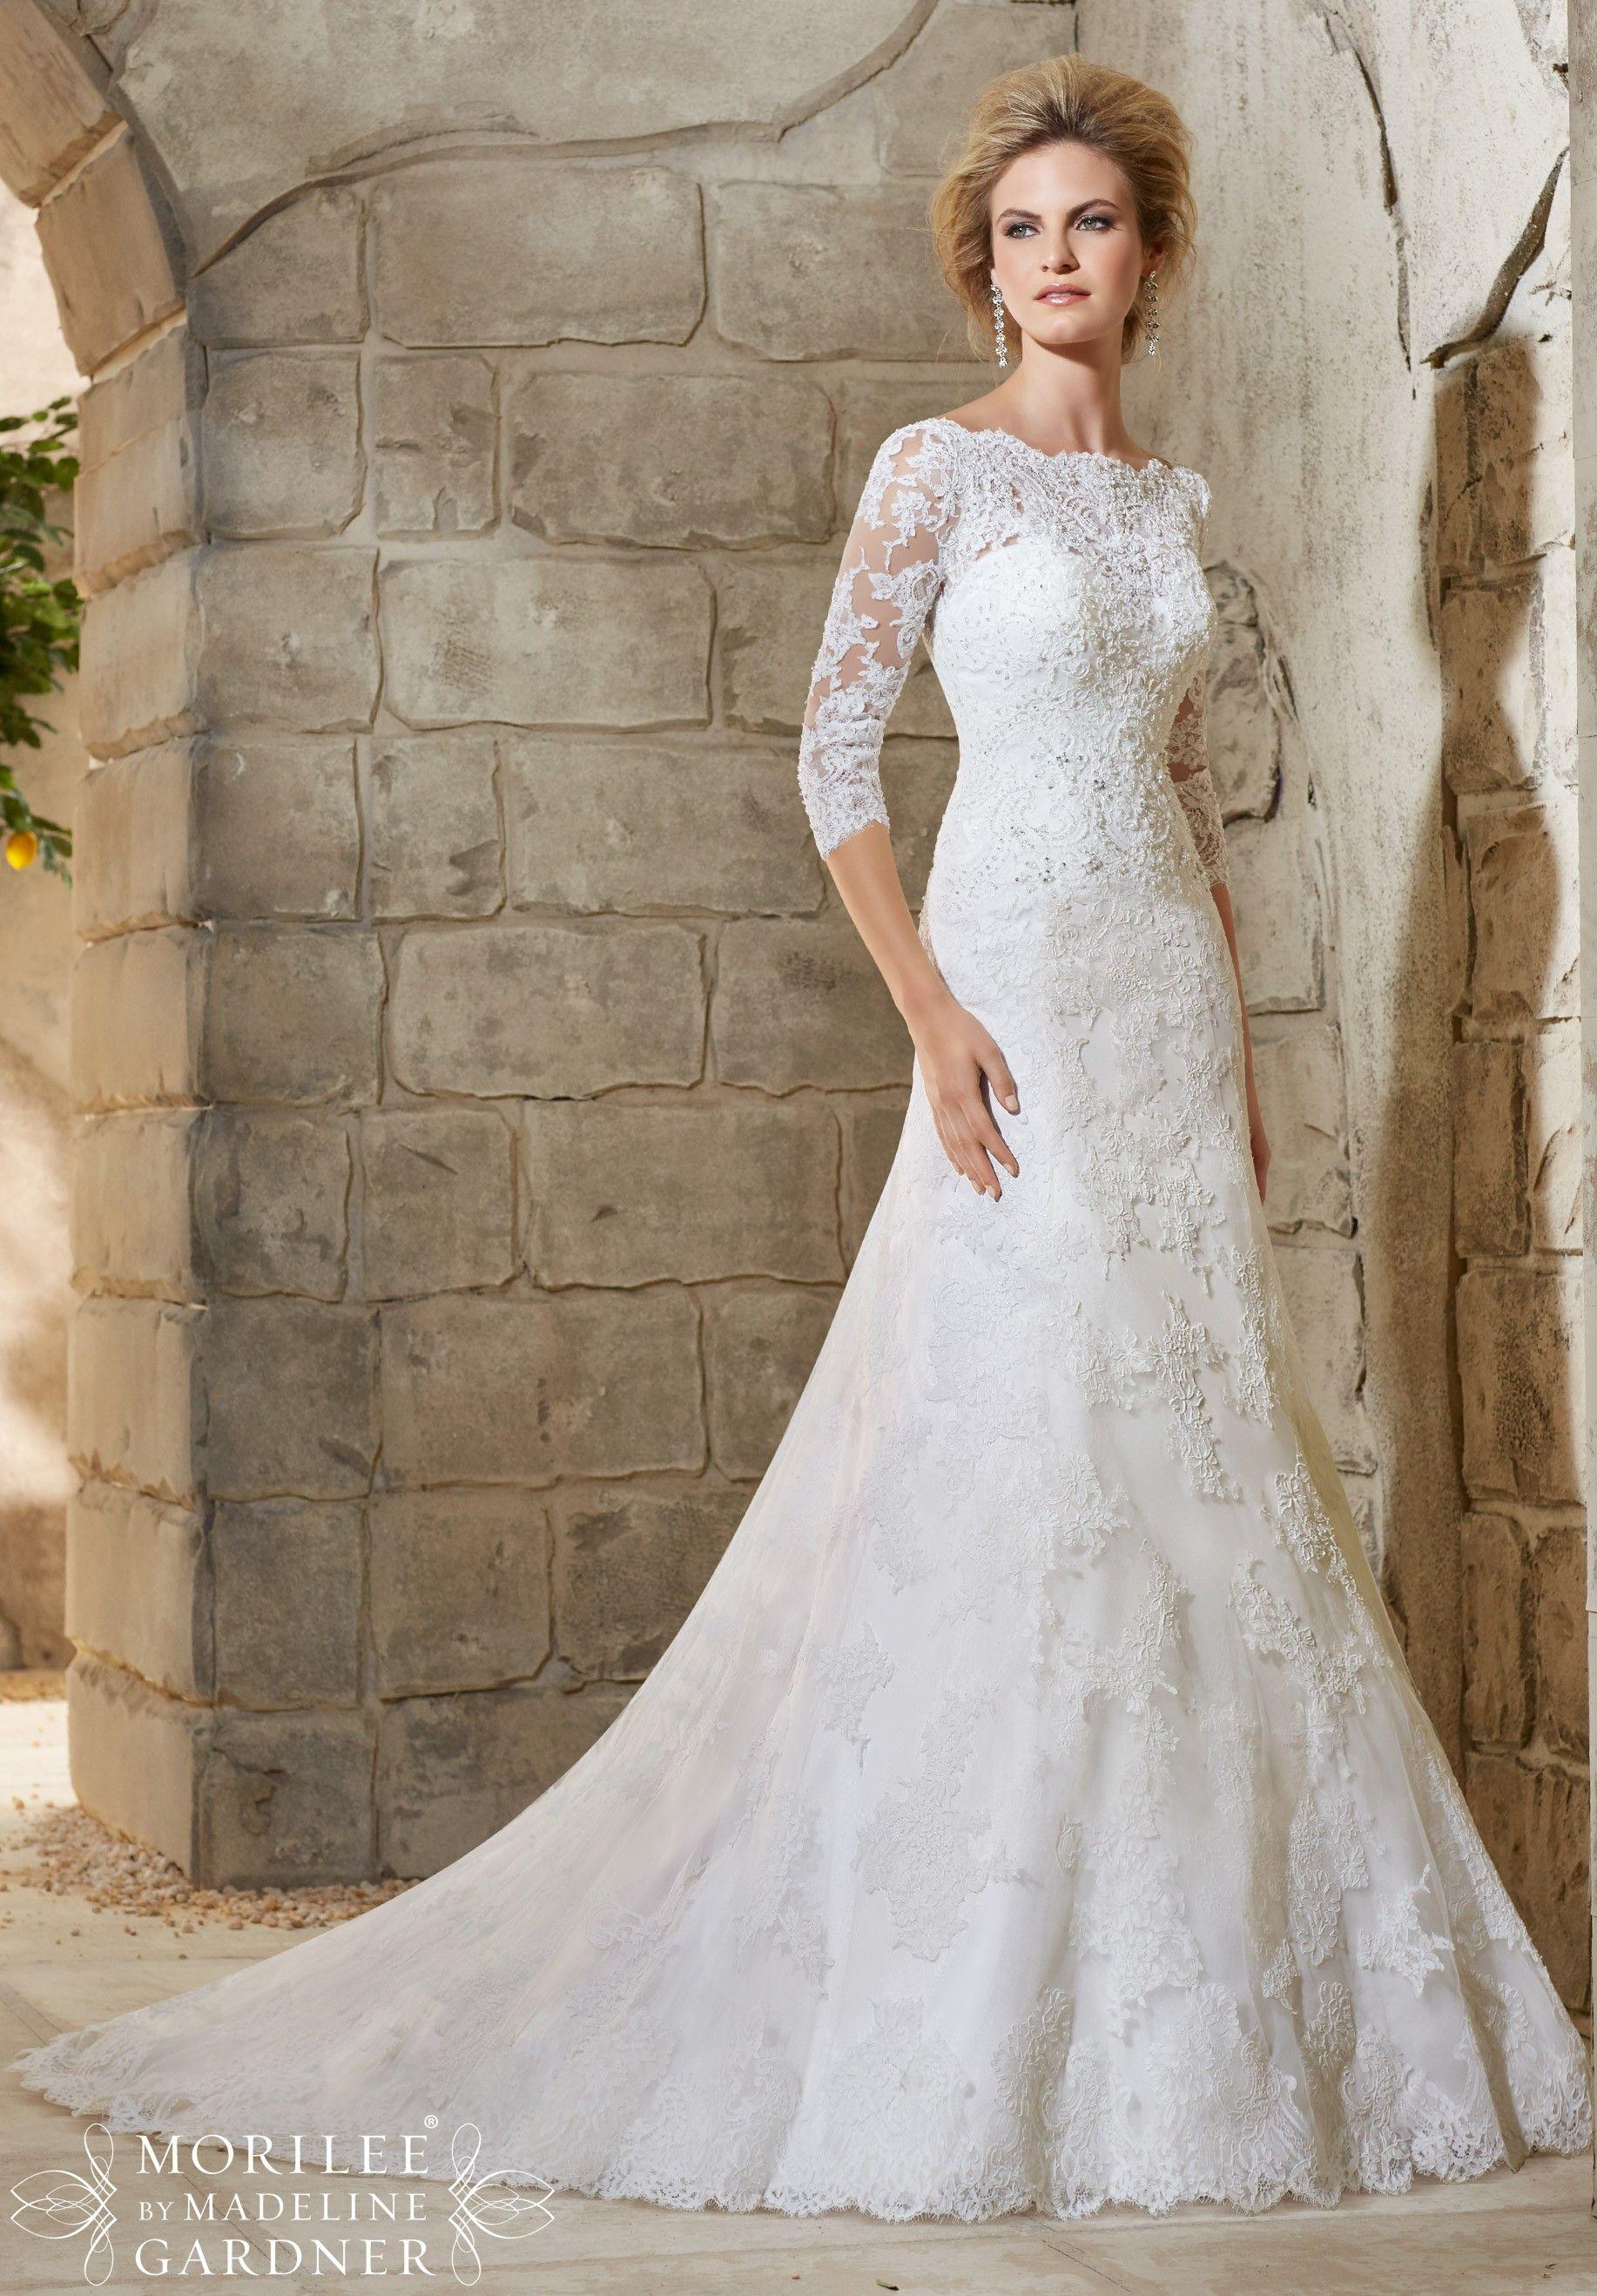 Morilee 2776 Size 12 Original Price 1739 Sale Price 1044 Mori Lee Wedding Dress Wedding Dresses Backless Lace Wedding Dress